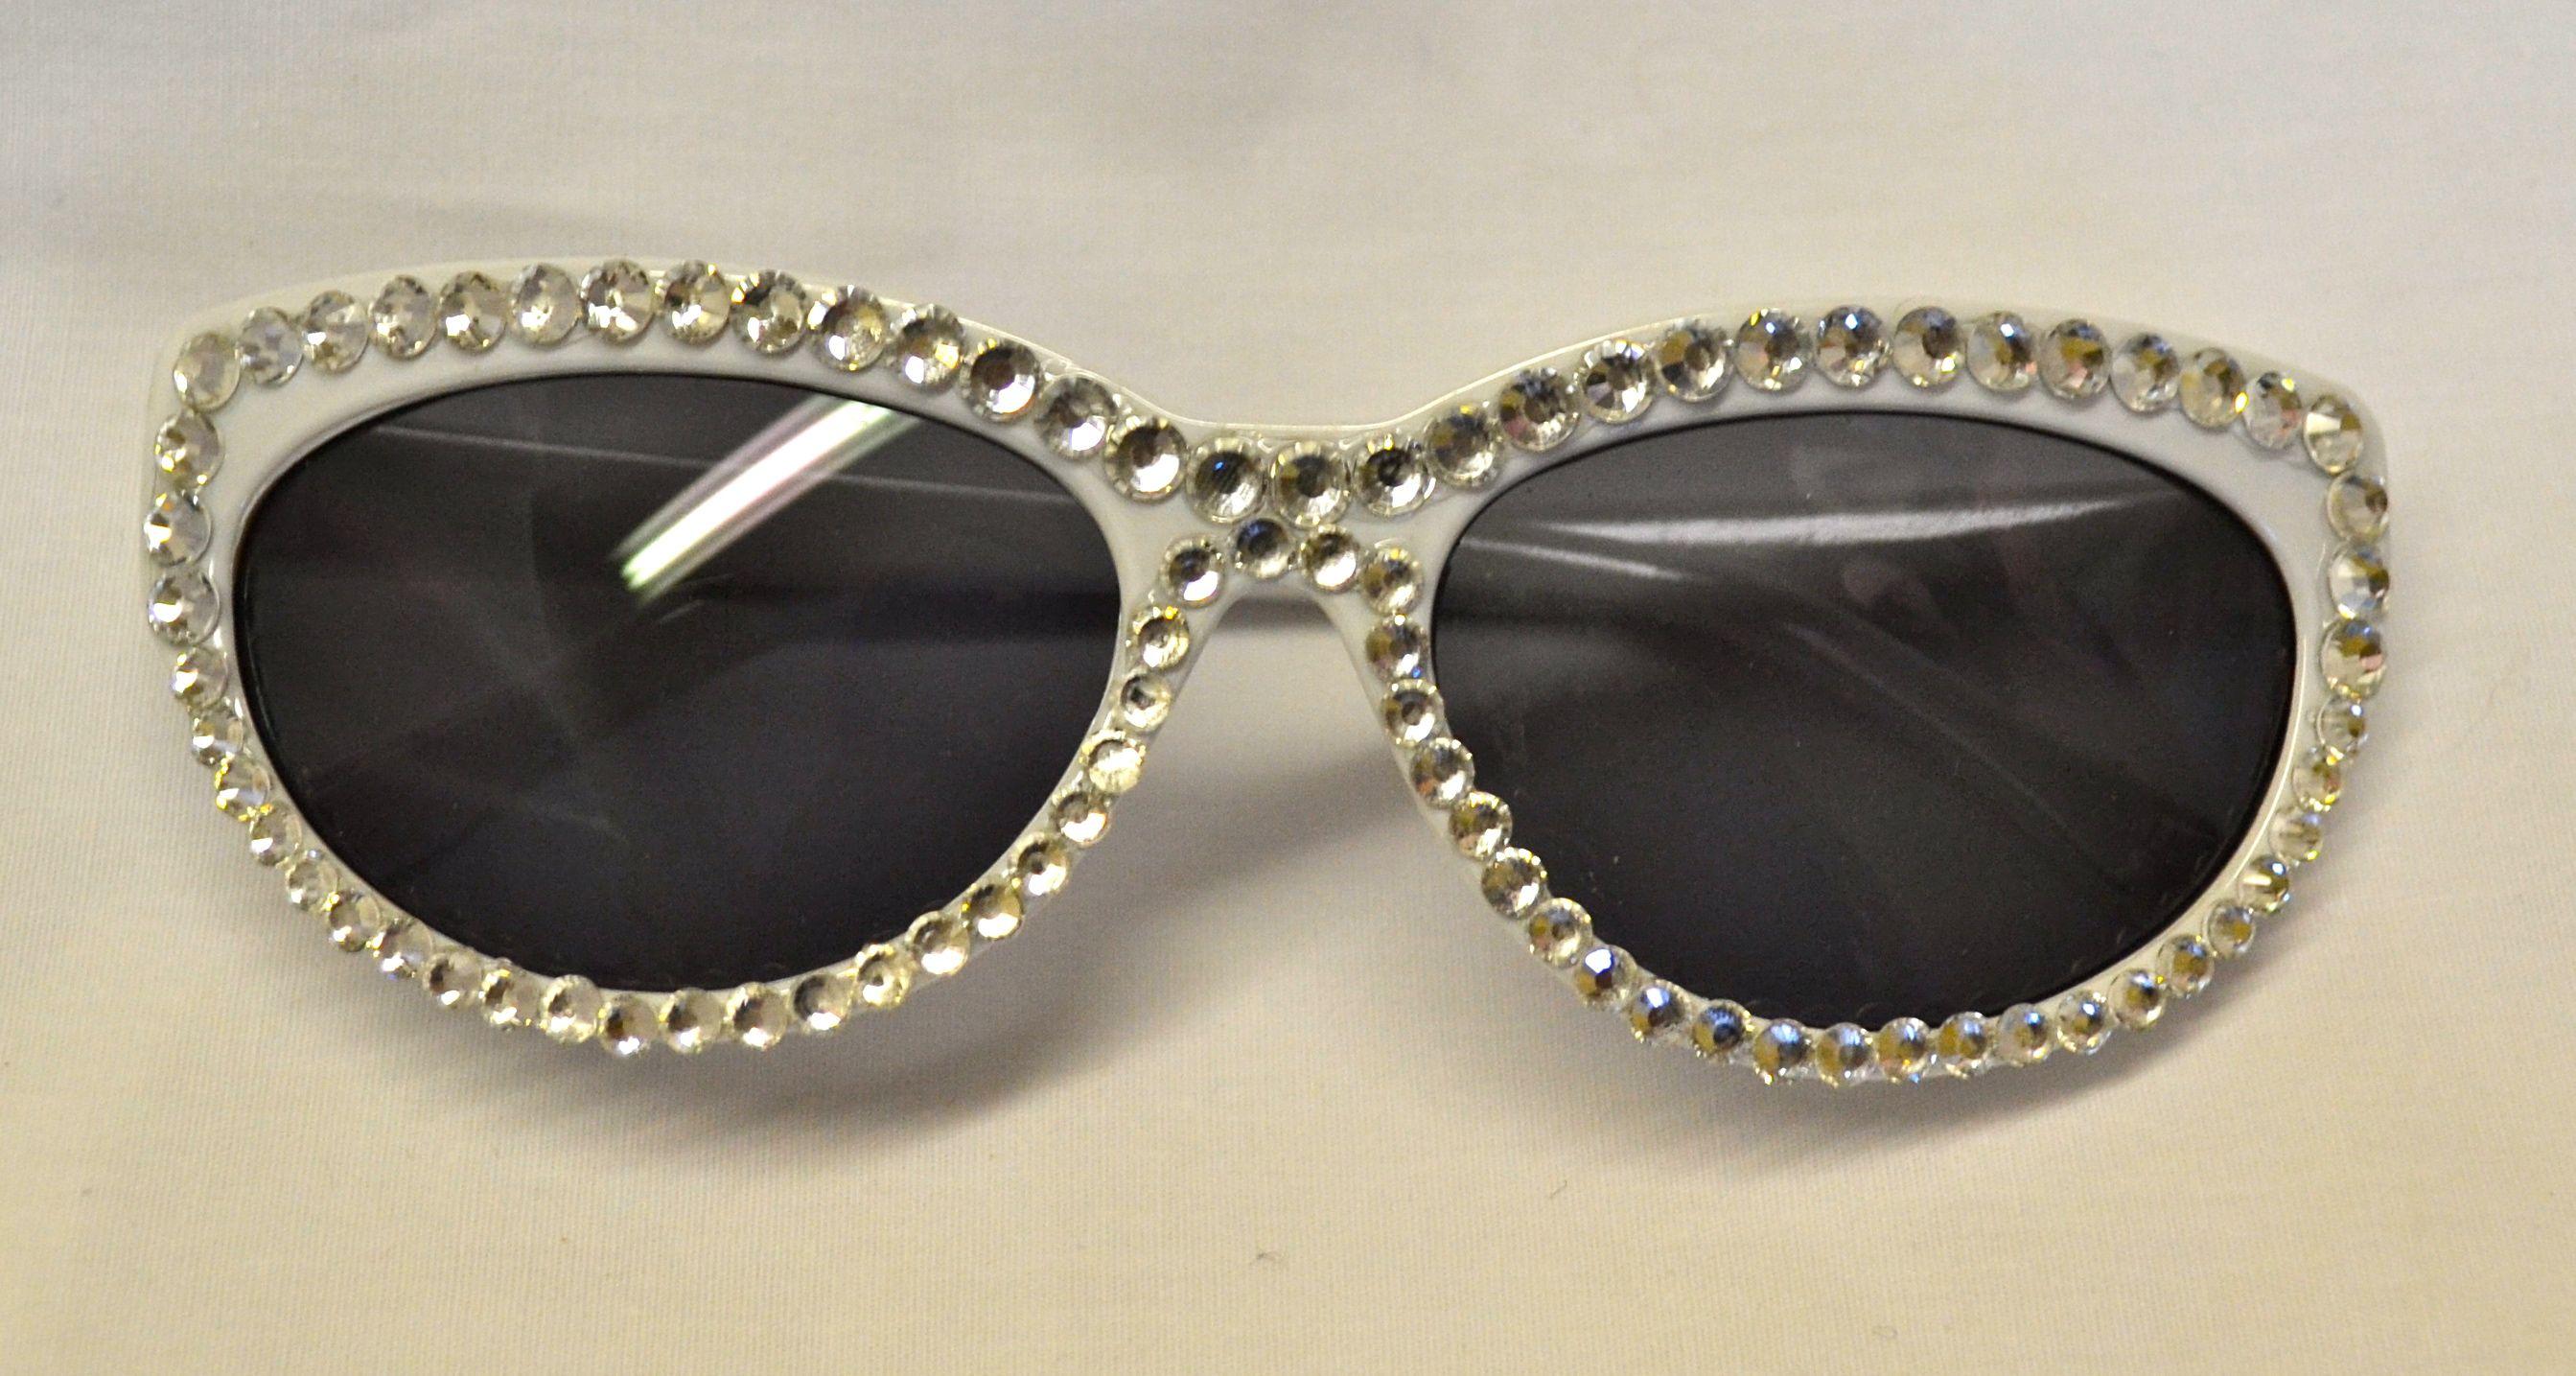 Rhinestoned sunglasses!  Perfect for Summer!  www.vavavette.com